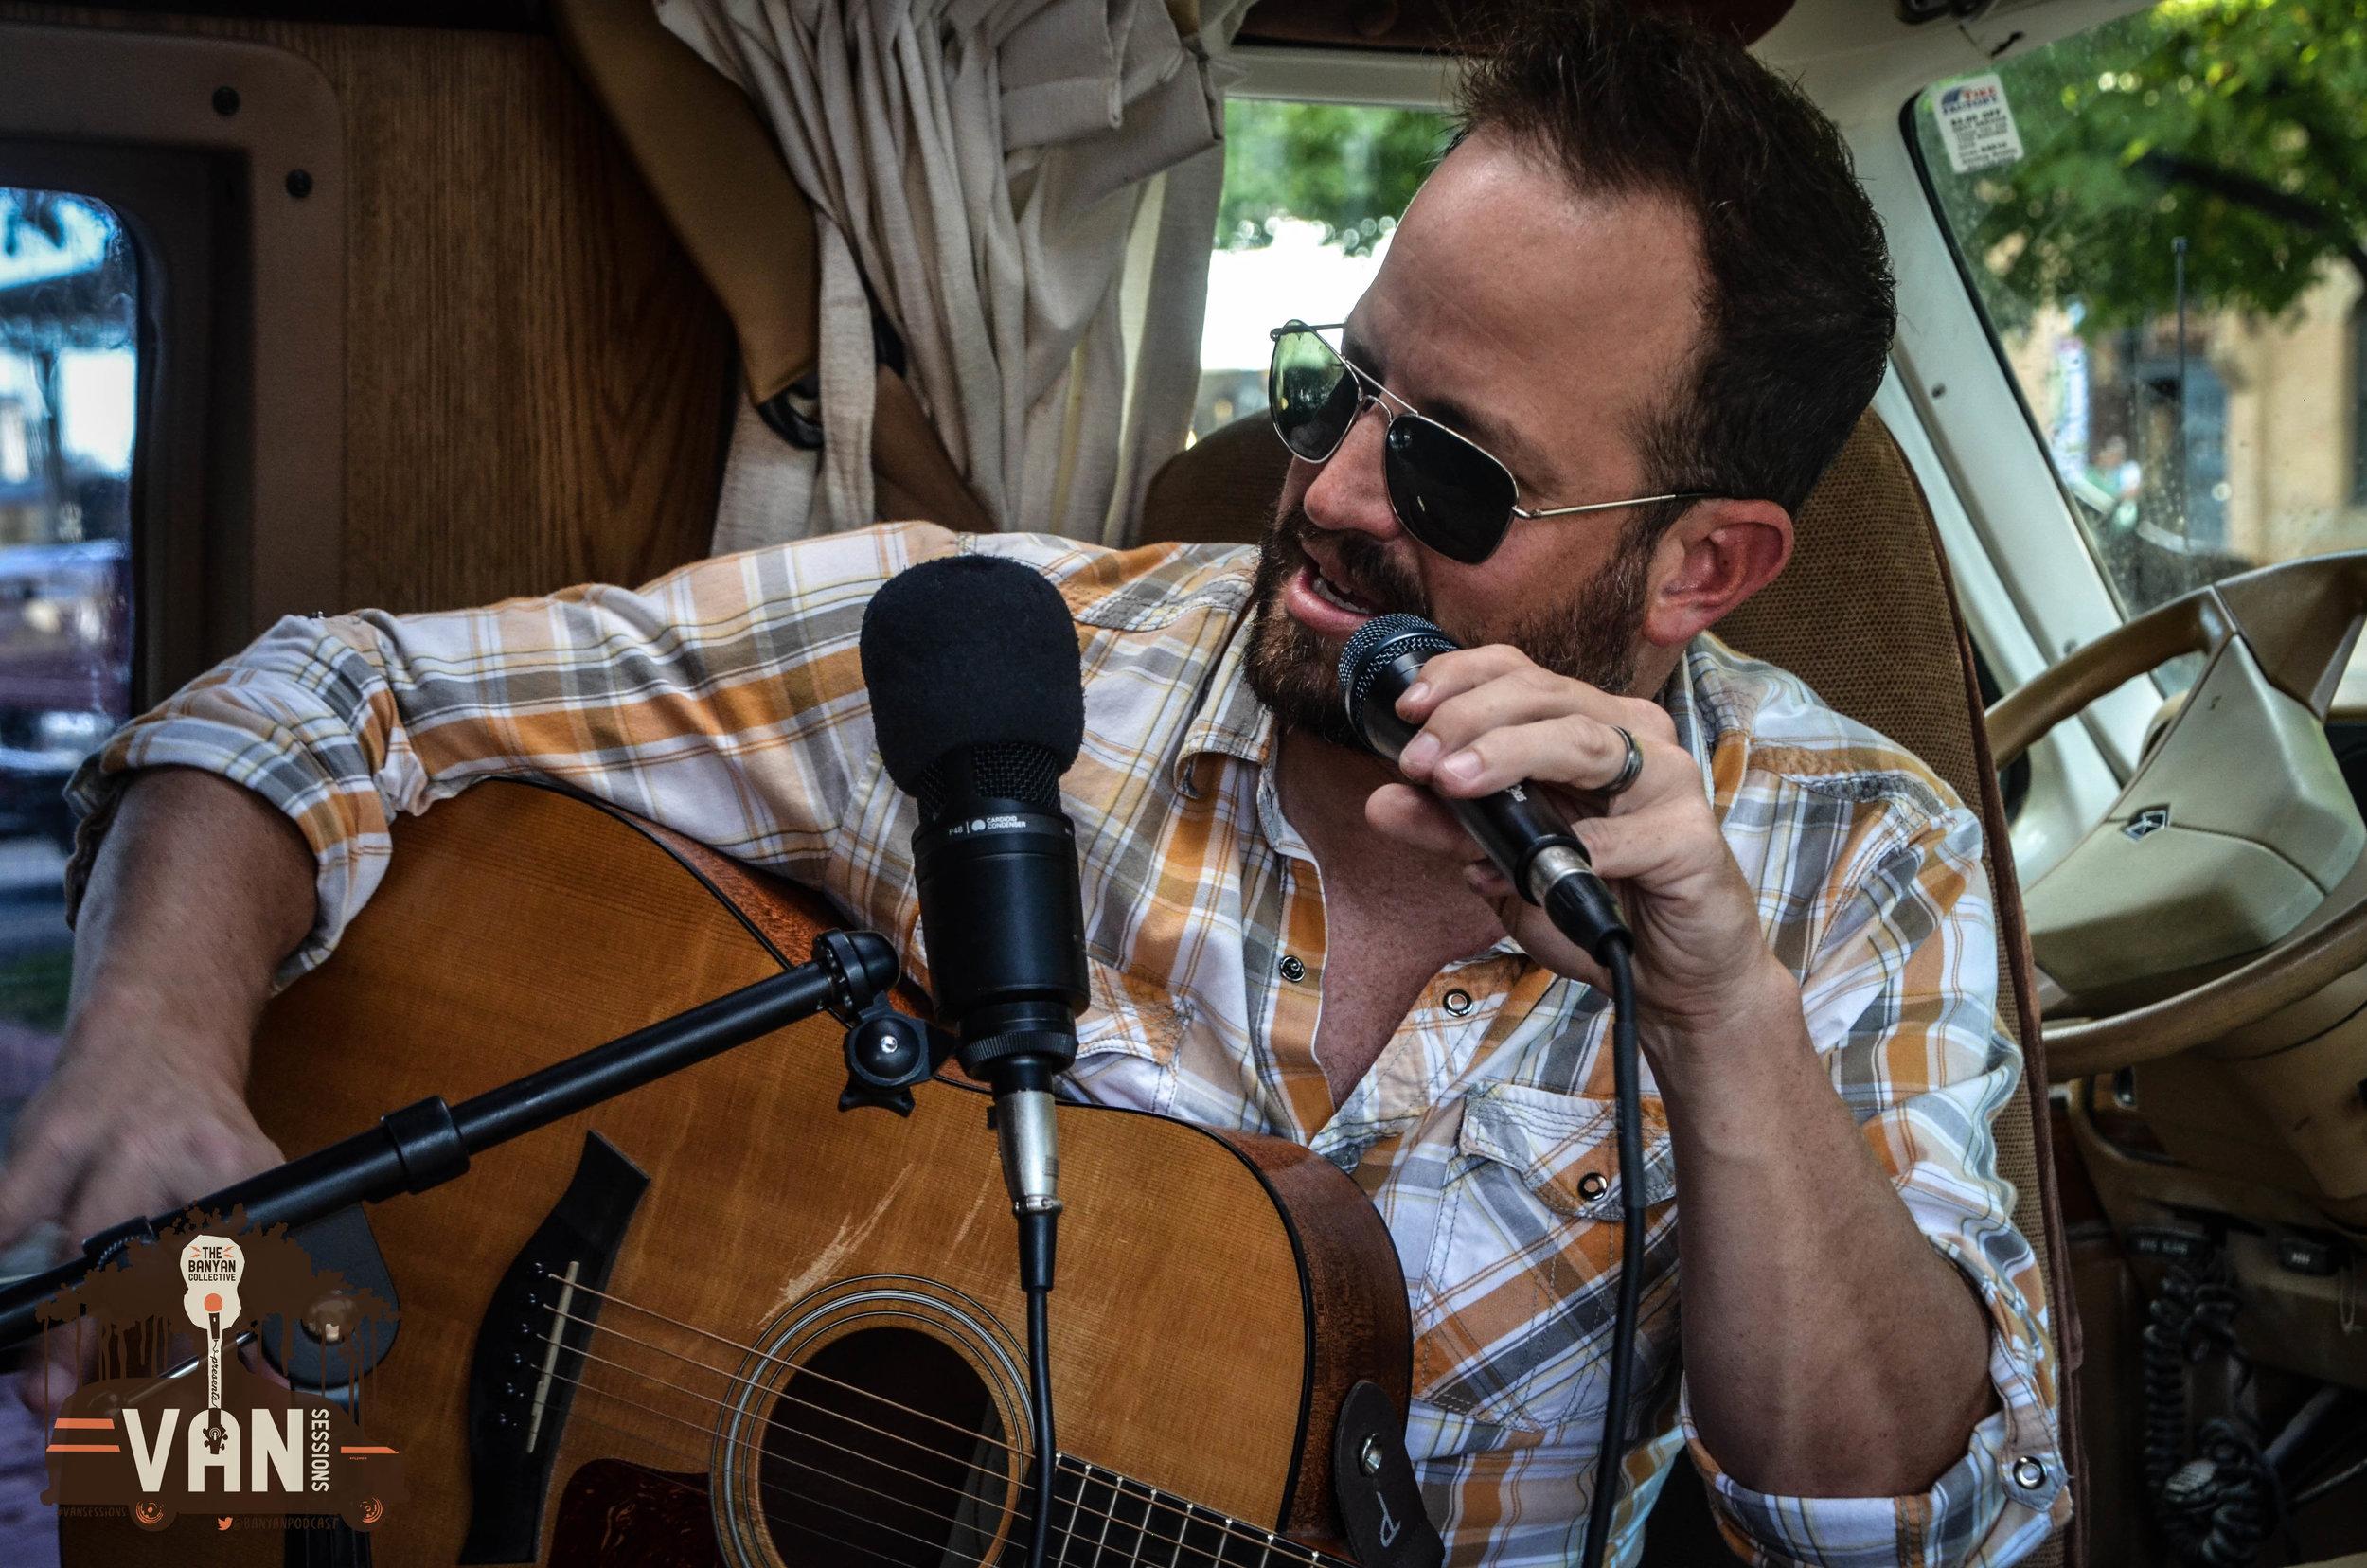 Dustin Wayne of the Wayne Hoskins Band during #VanSessions